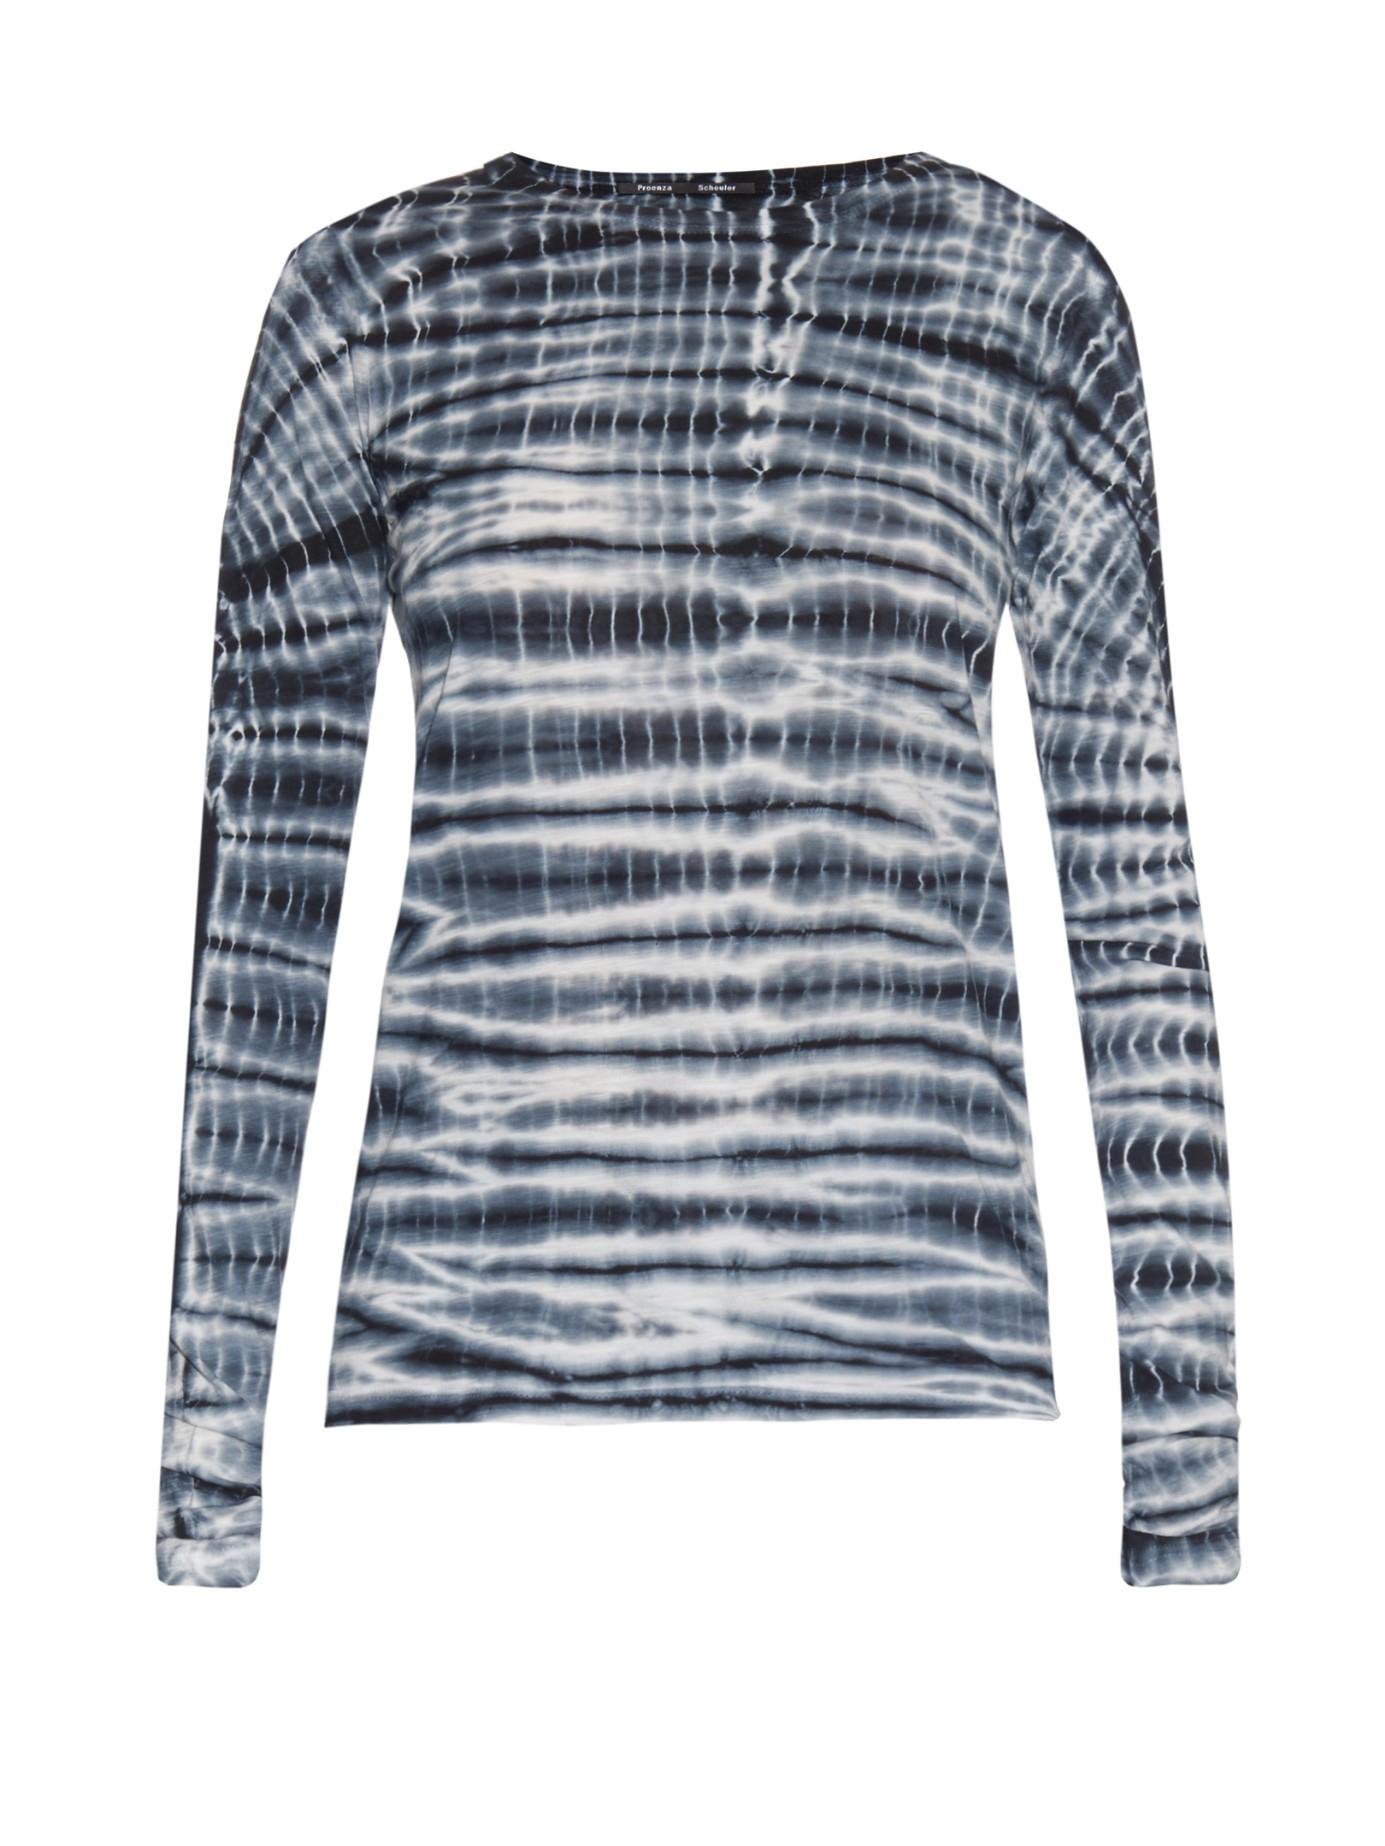 Lyst proenza schouler tie dye print jersey t shirt in black for Black and blue tie dye t shirts